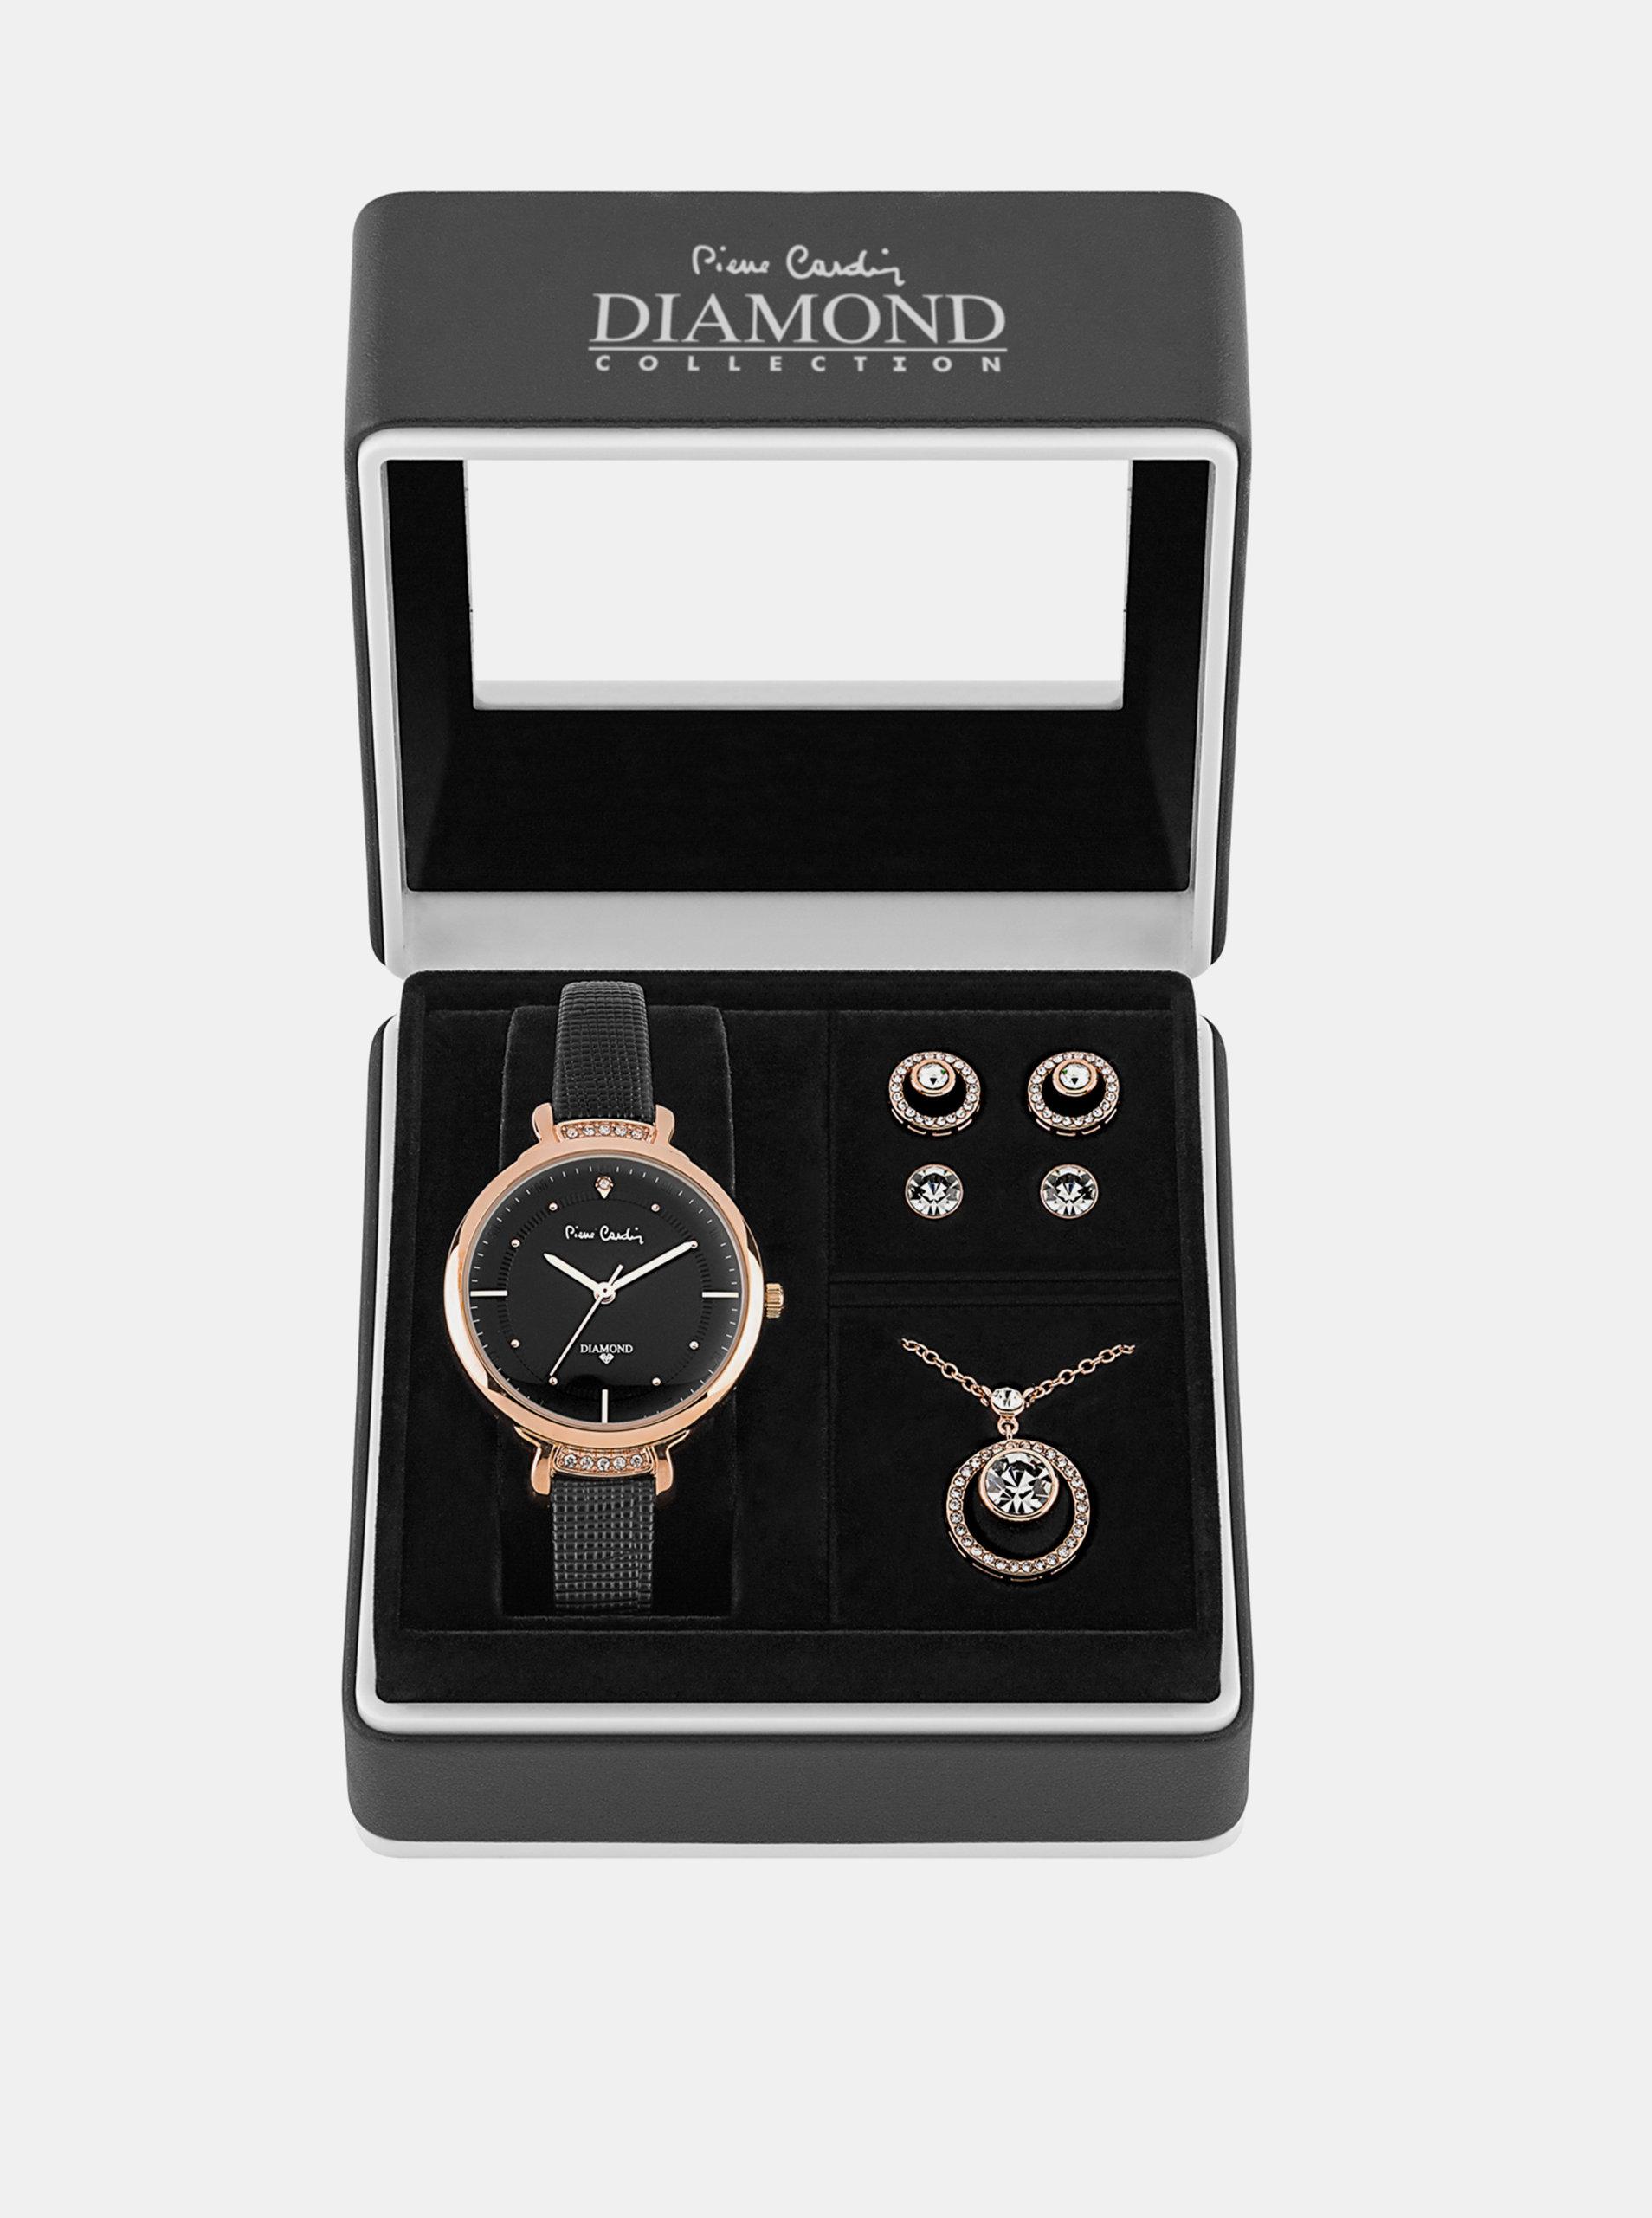 Sada dámských hodinek s koženým páskem a šperků v růžovozlaté barvě Pierre Cardin